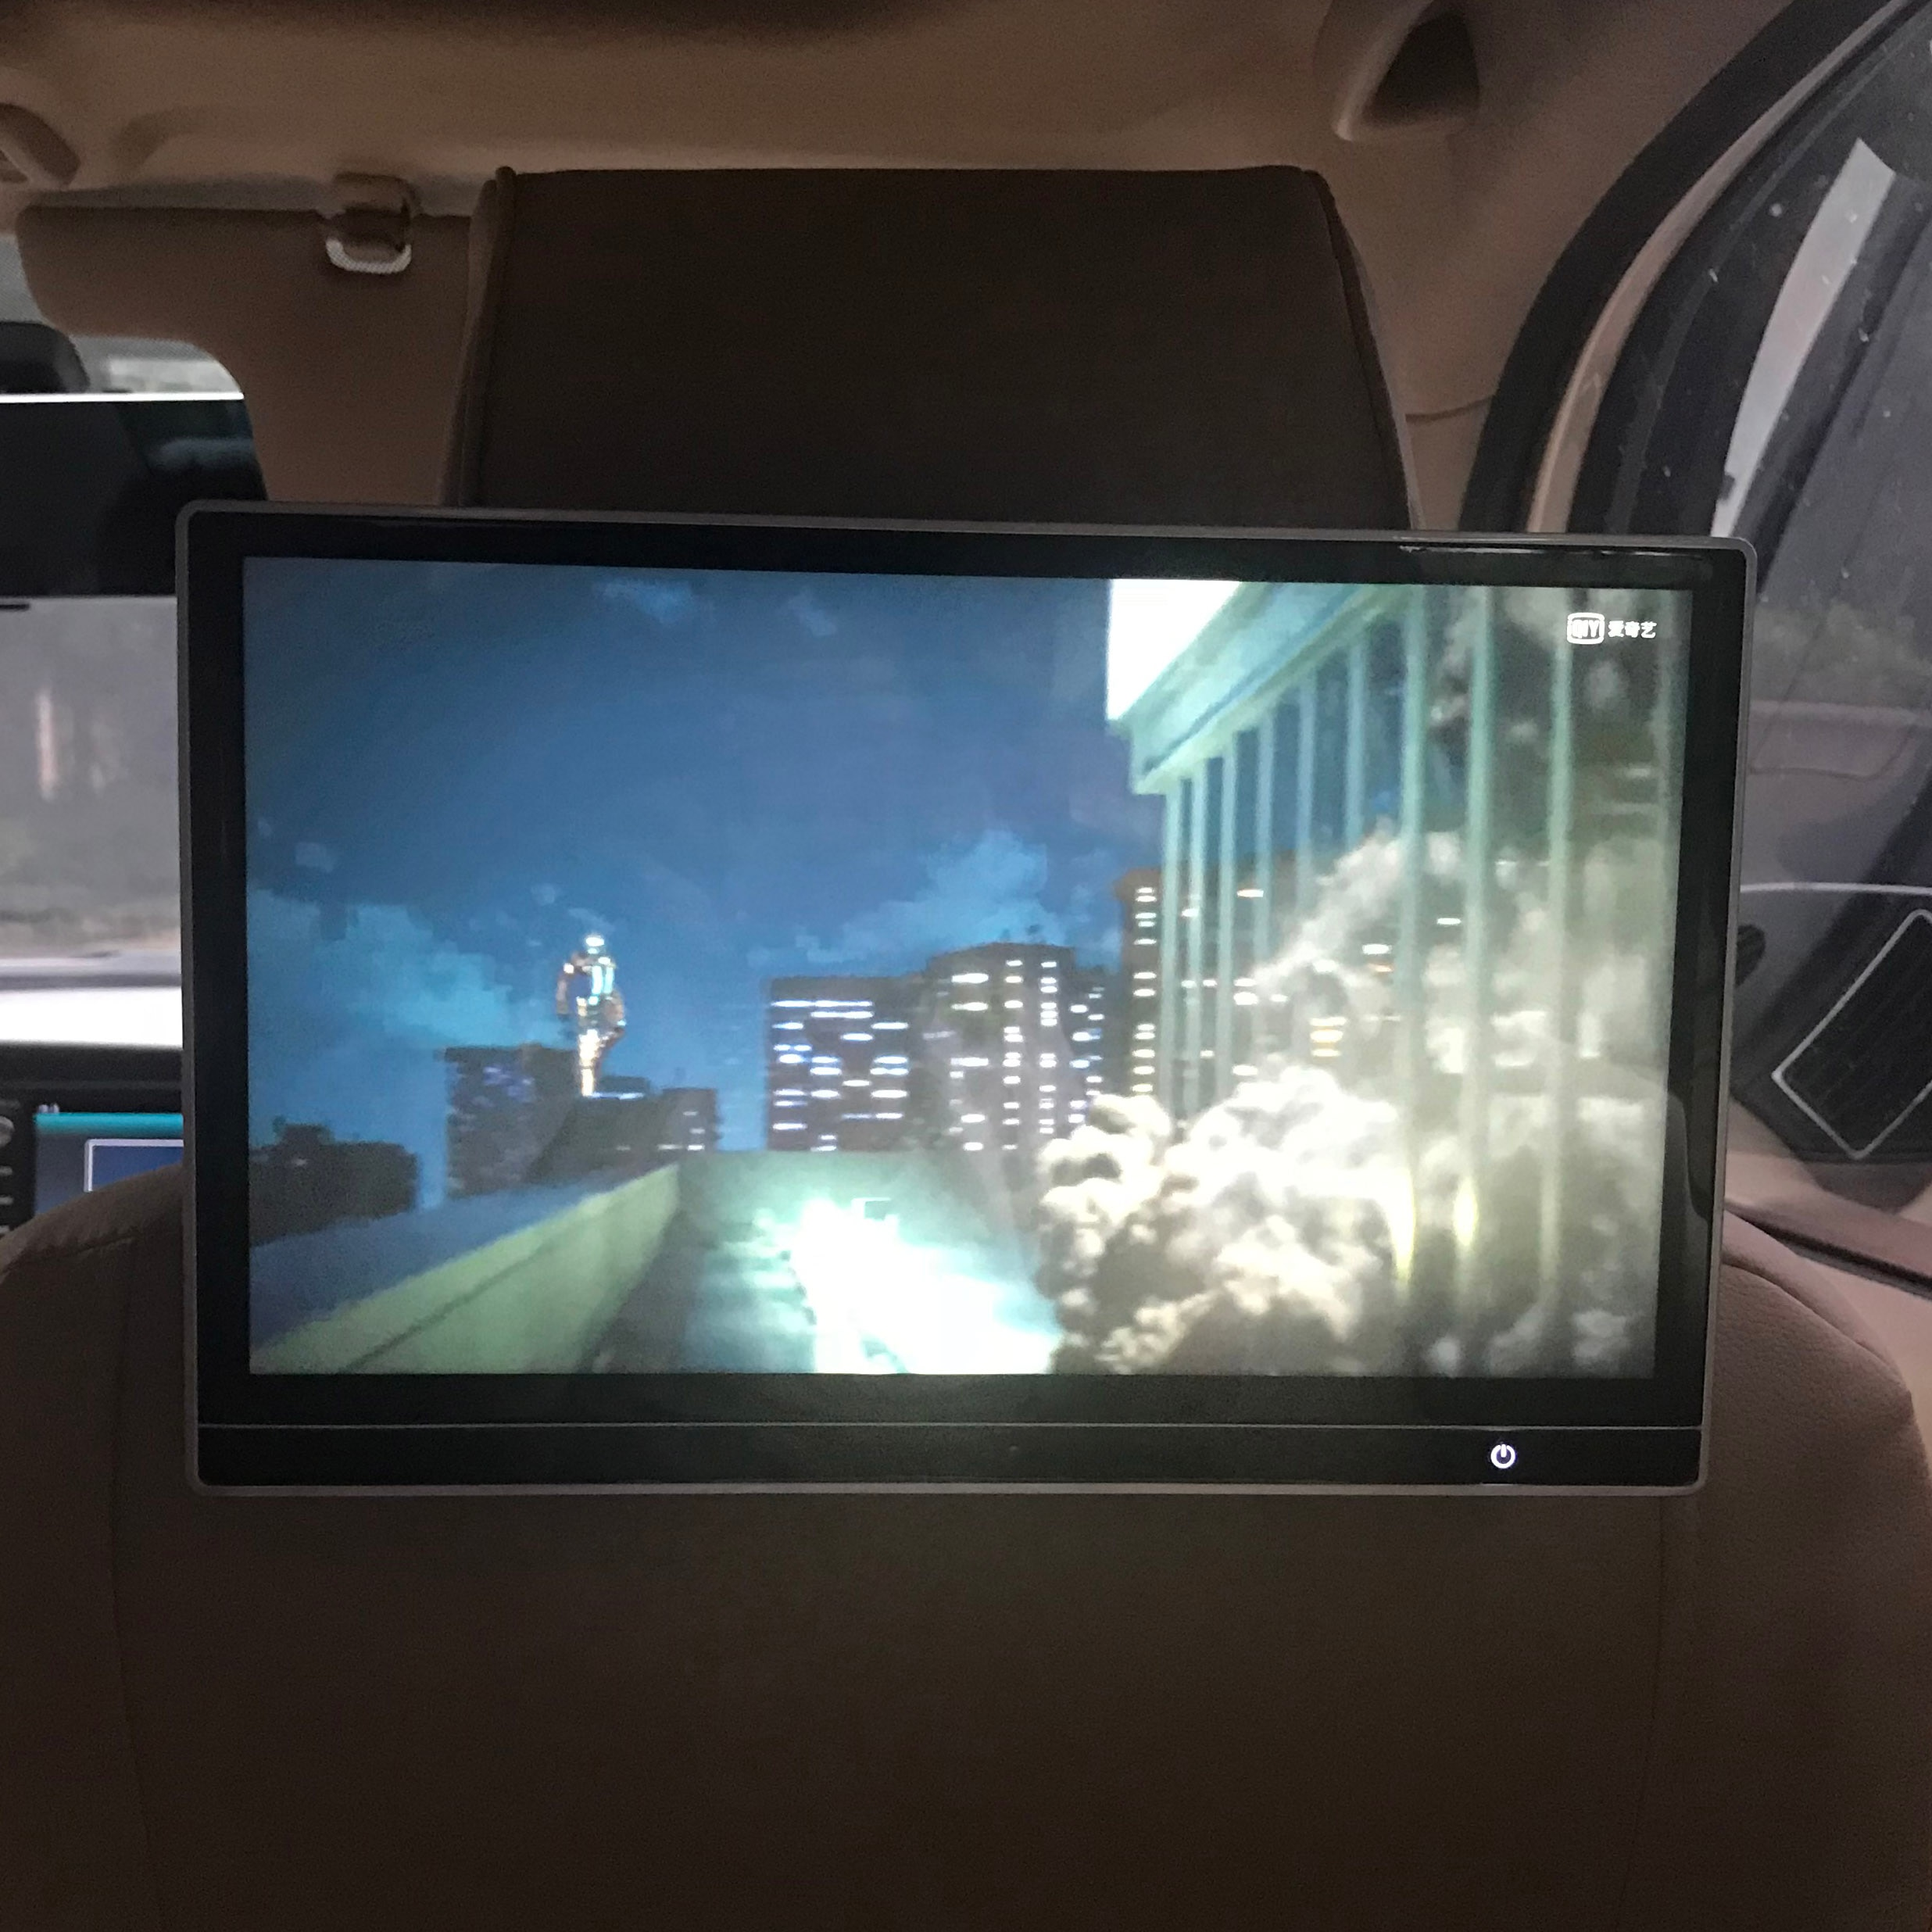 12,5 pulgadas Android 9,0 8-core 2GB + 16GB Monitor para reposacabezas de coche para Mazda 3 6 CX-3 CX-4 CX-5 CX-8 MX-5 de entretenimiento para asiento trasero sistema